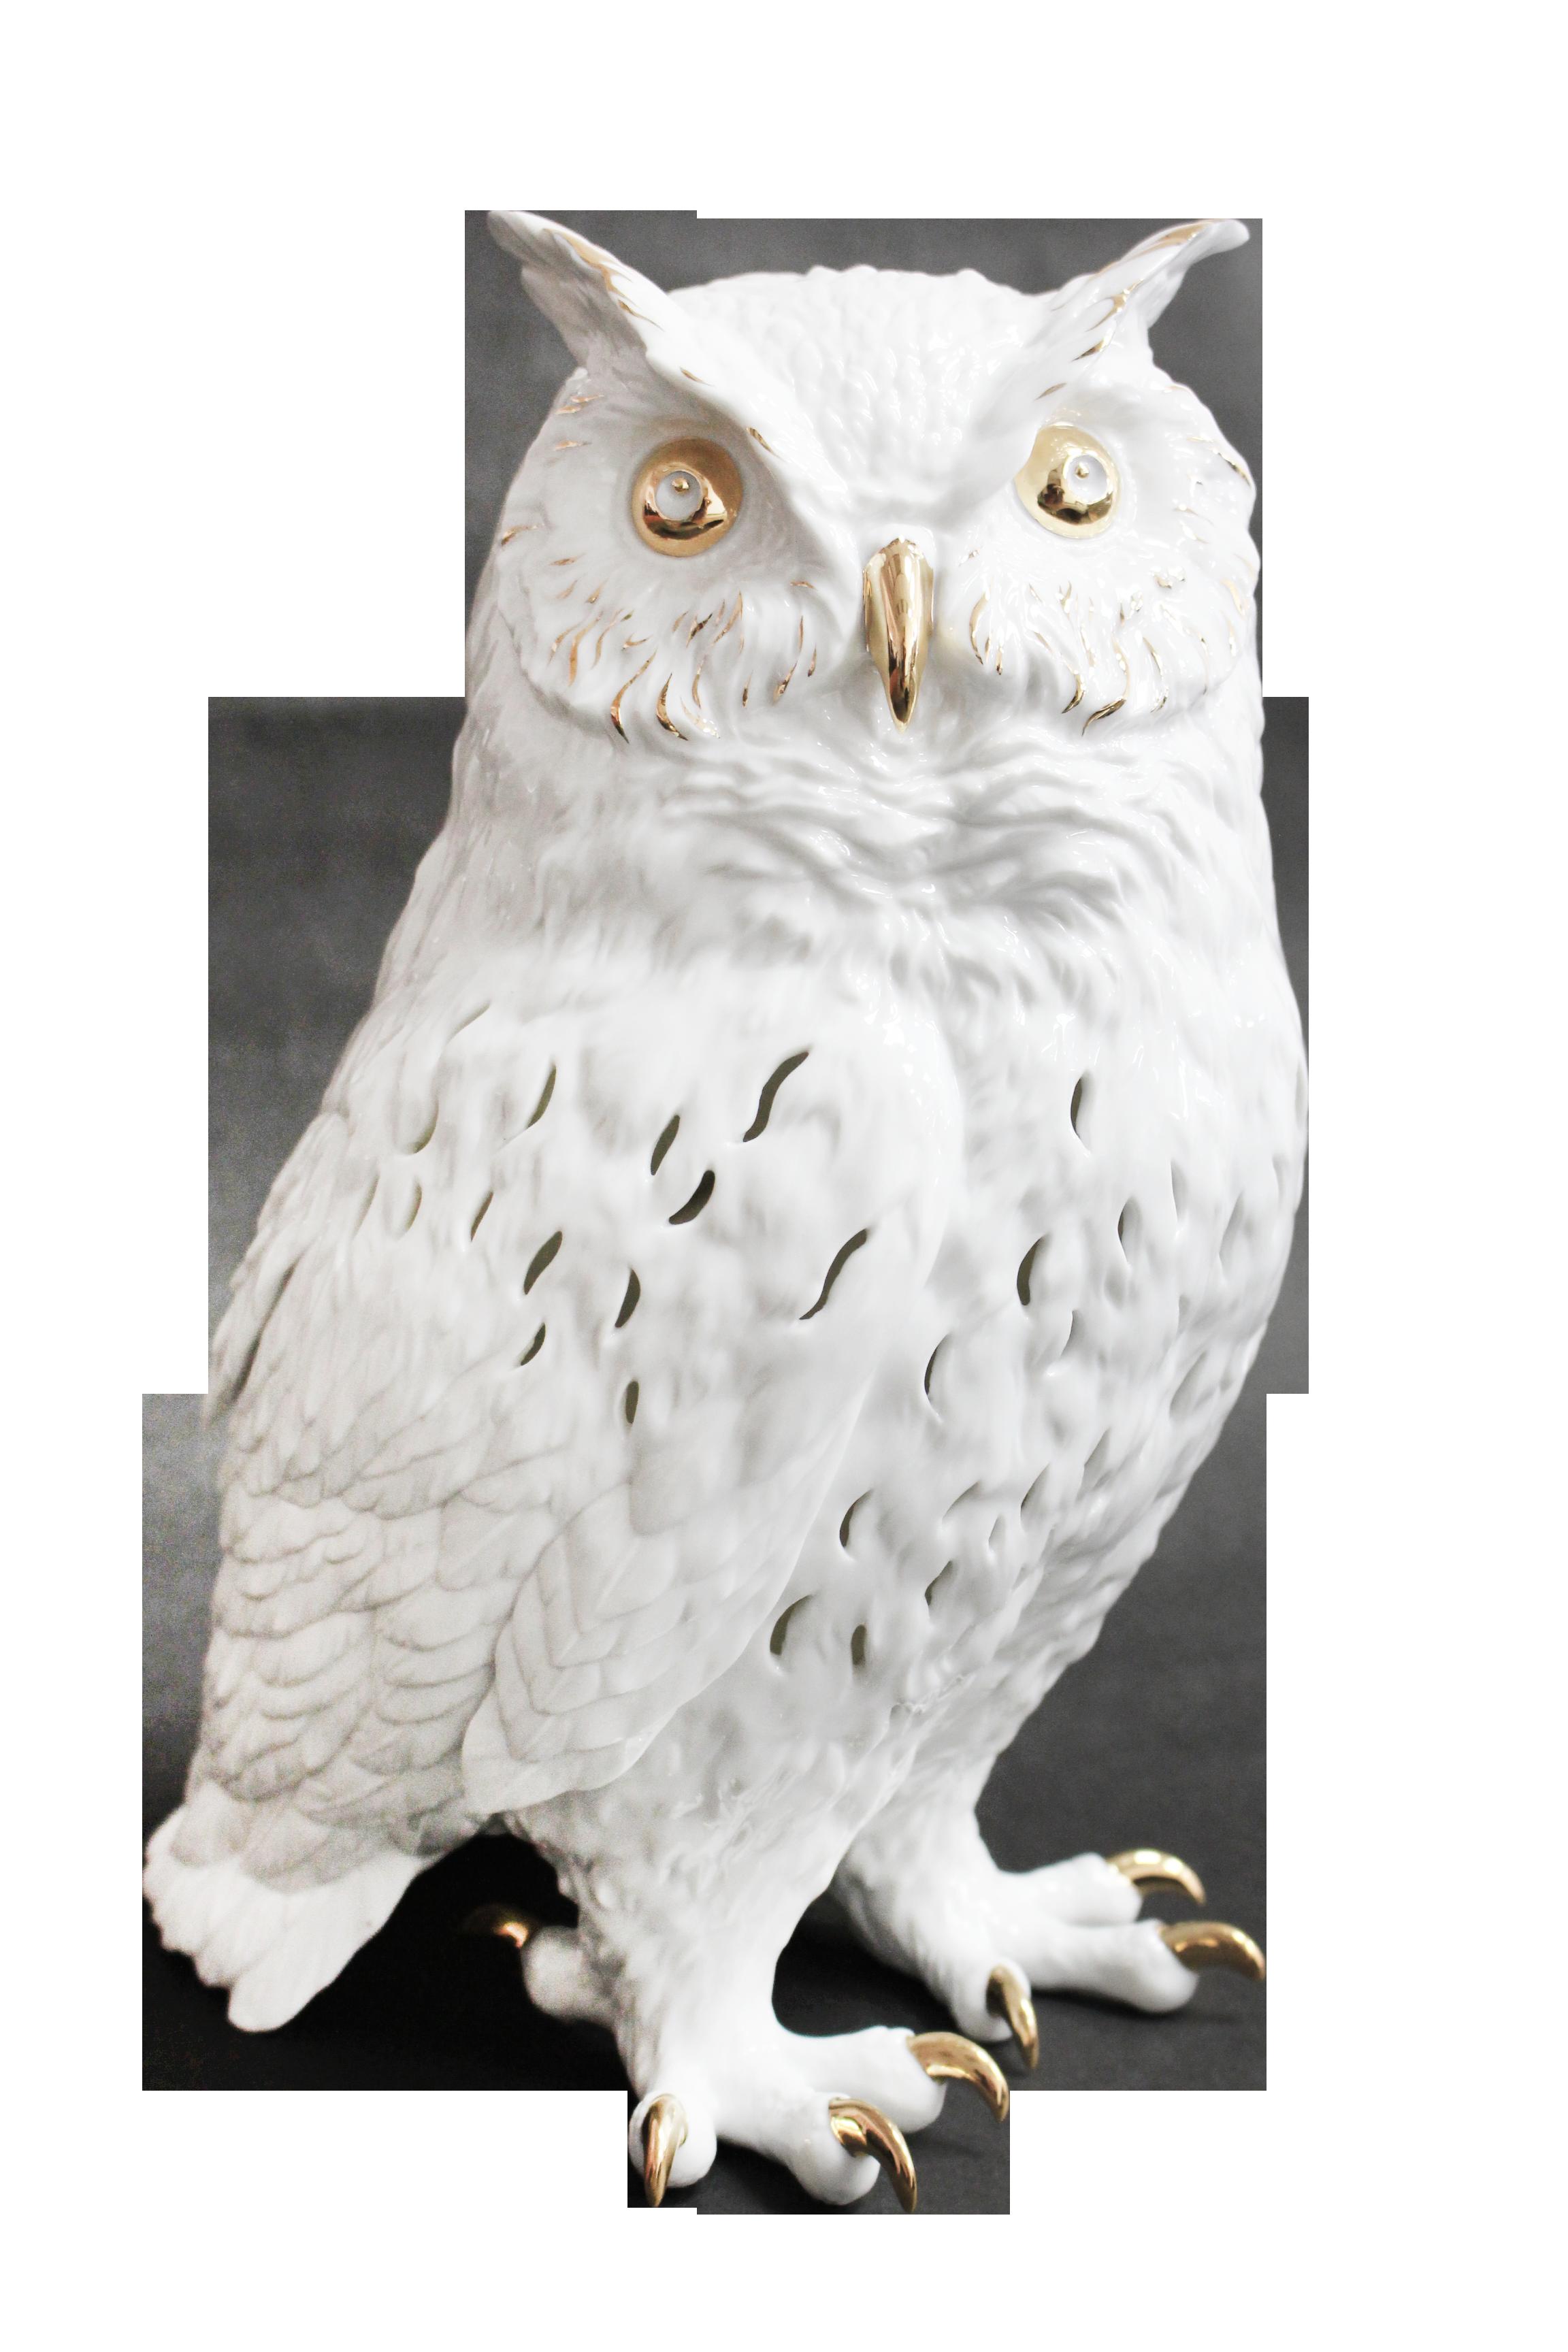 睿智Owl Lamps